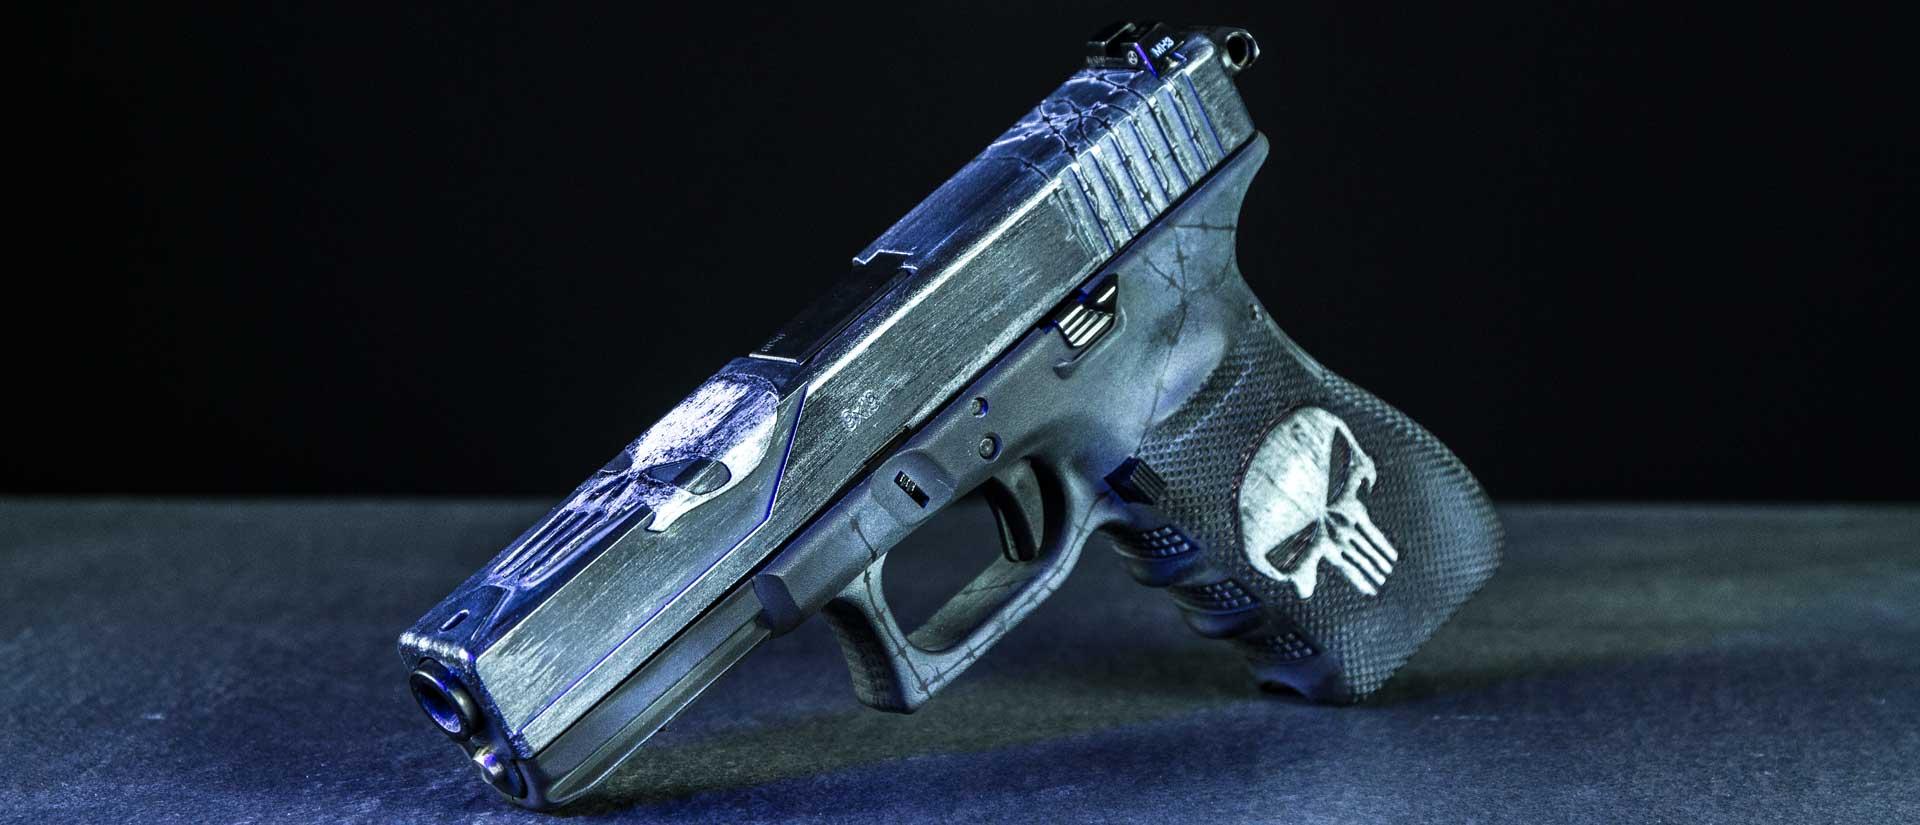 verex-tactical-tuning-waffen-pistole-glock-sig-sauer-17-cz-walther-visier-bruenieren-ar15-red-dot-beschichtung-tuning-cerakote-stippling-griptech-salzburg-slider-01